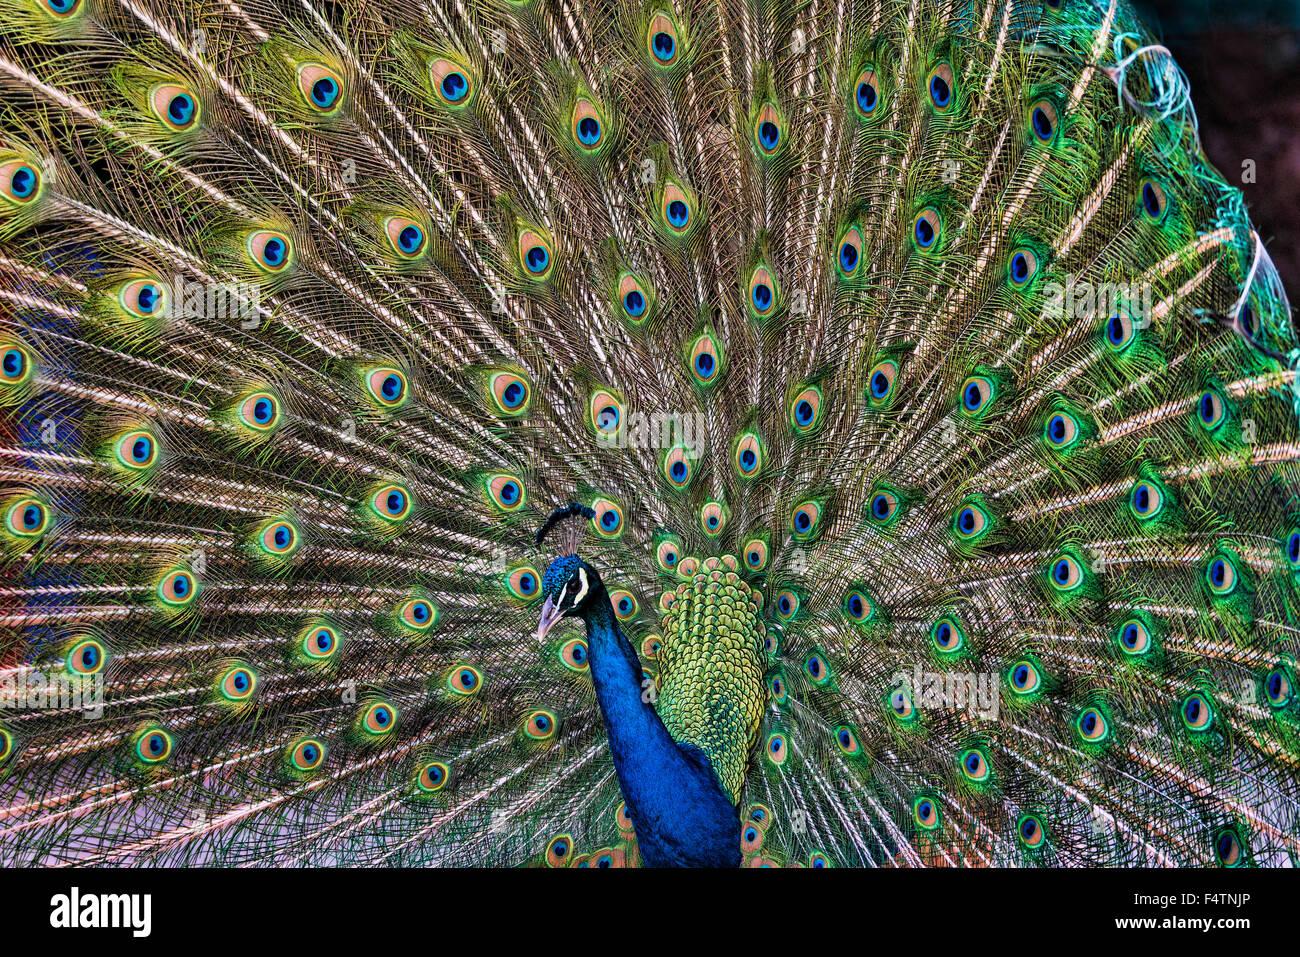 male, peacock, indian peafowl, pavo cristatus, bird - Stock Image